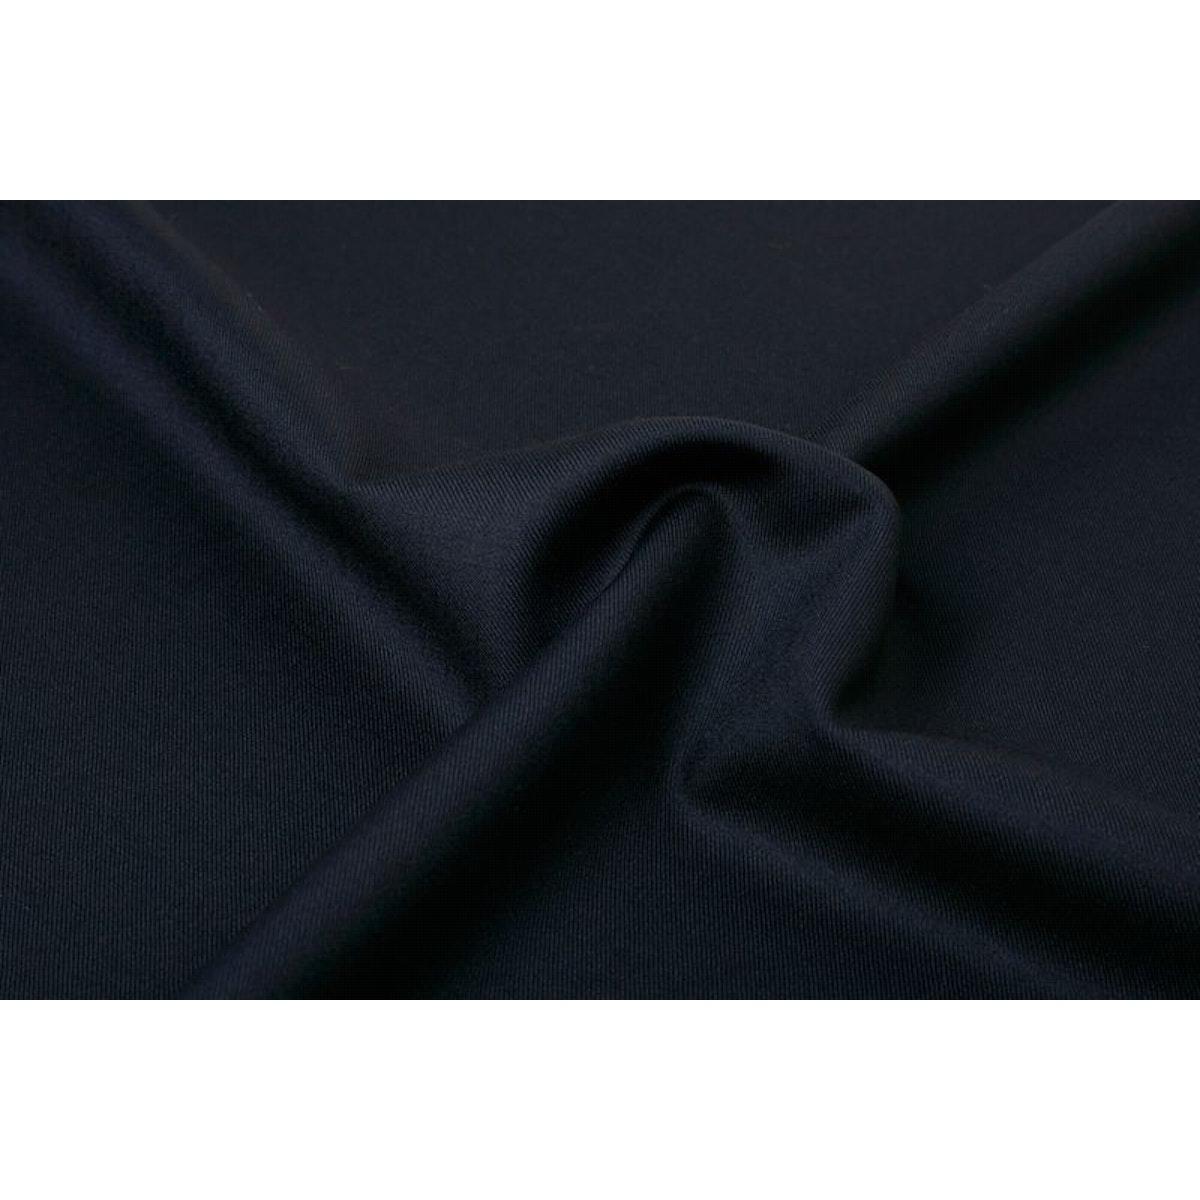 InStitchu Suit Fabric 22